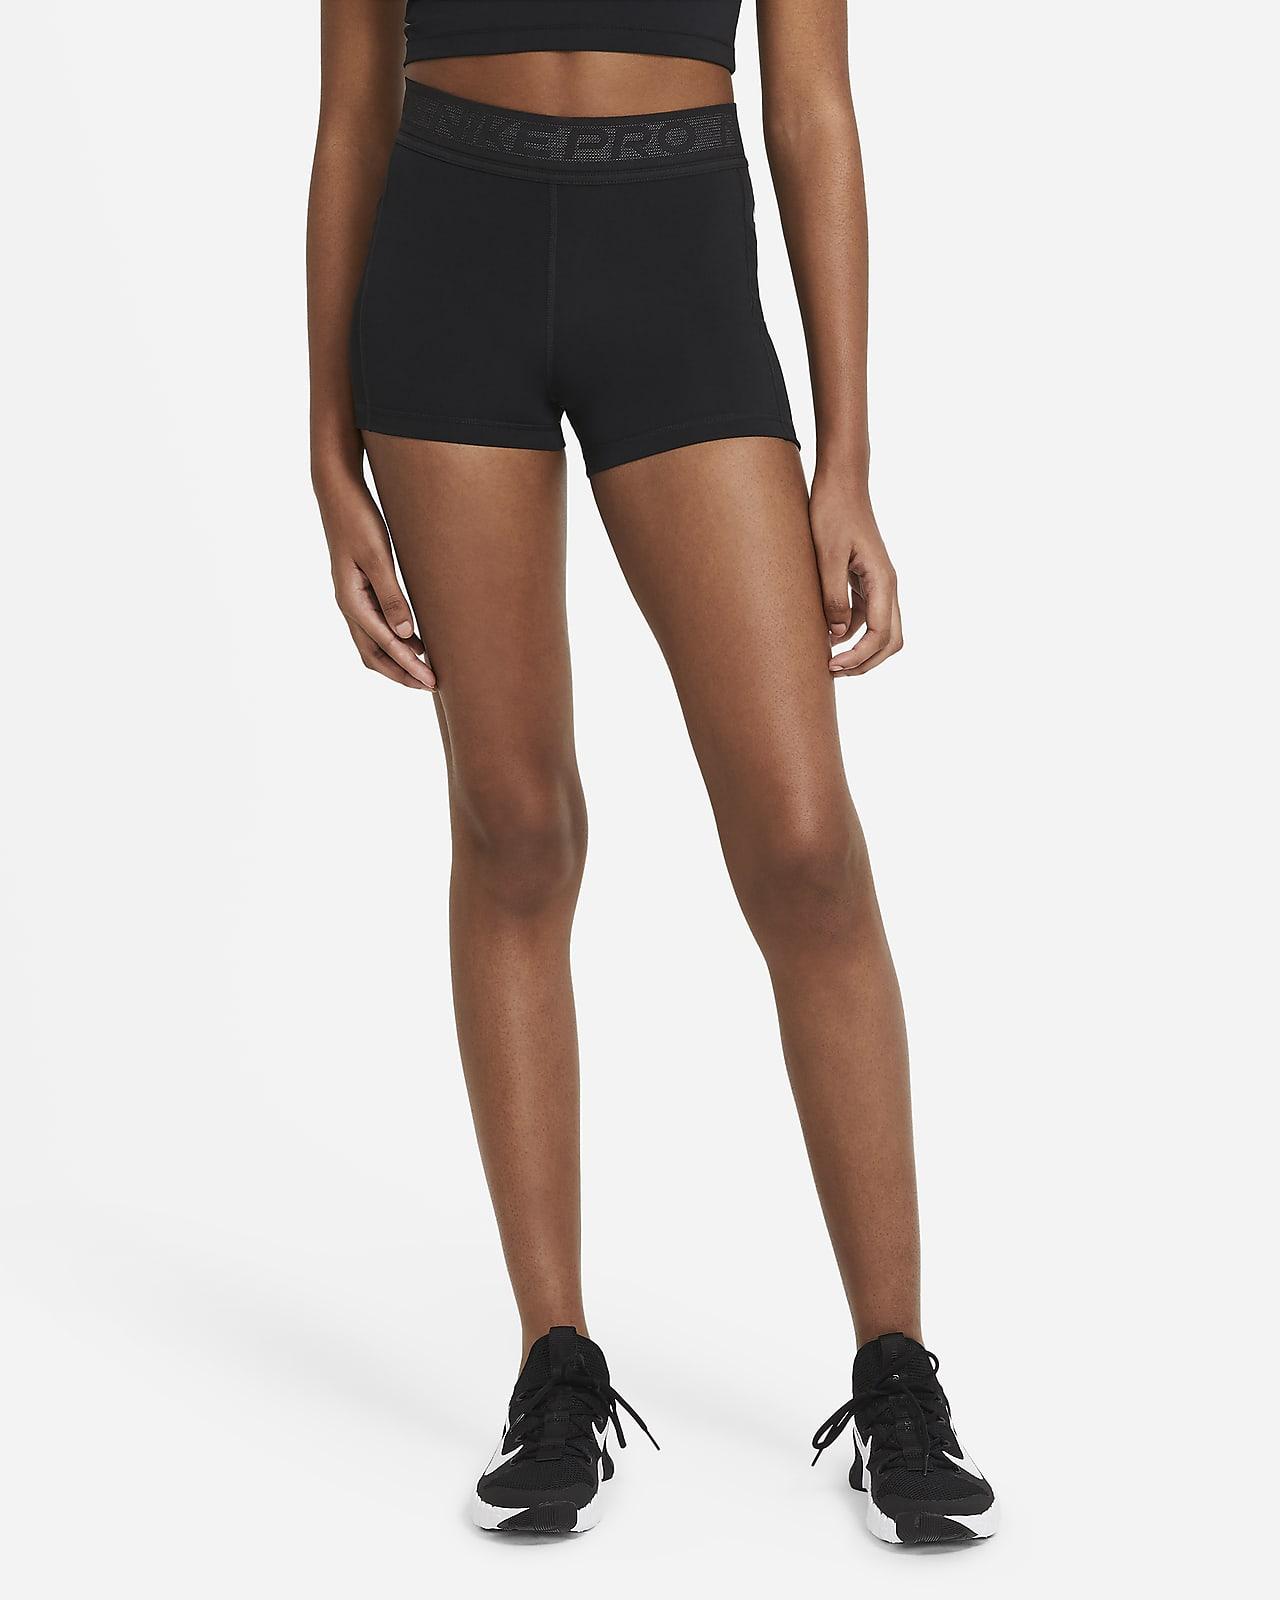 Nike Pro Women's 8cm (approx.) Shorts